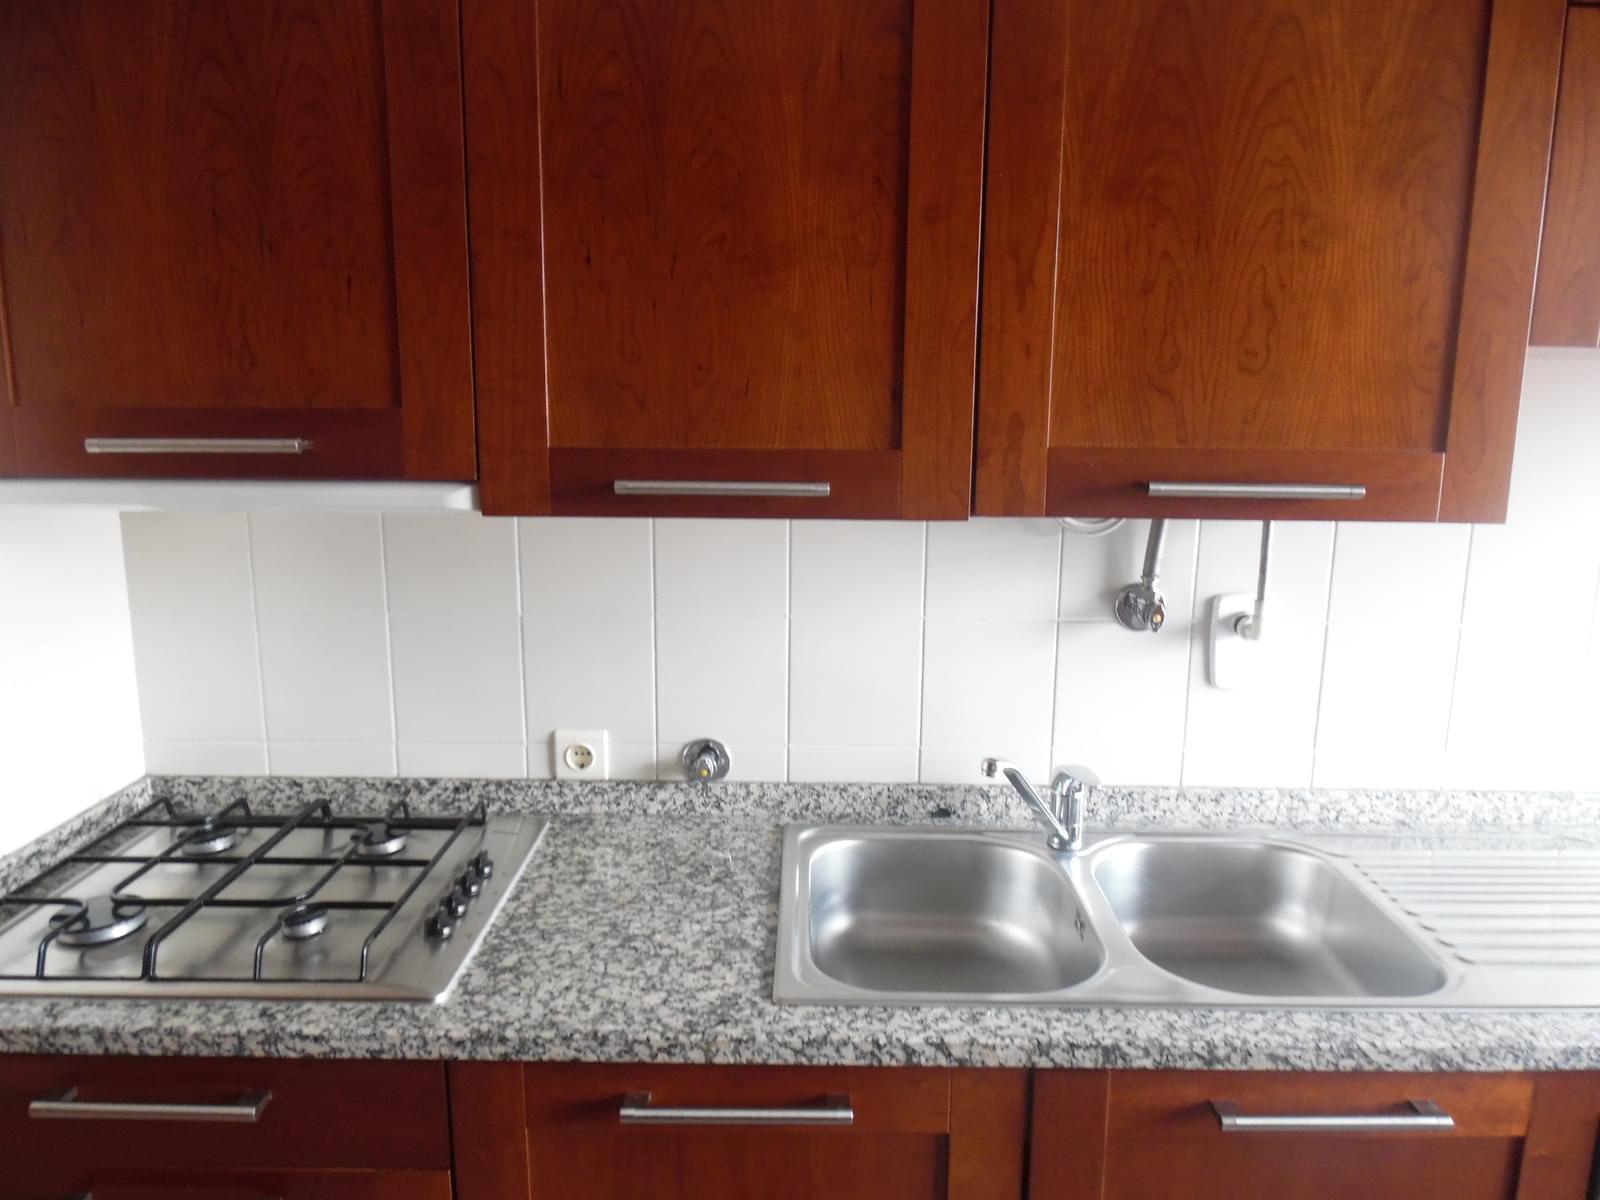 pf18329-apartamento-t1-lisboa-7c56ad8f-3e24-4a4b-a768-3c9428a306ff